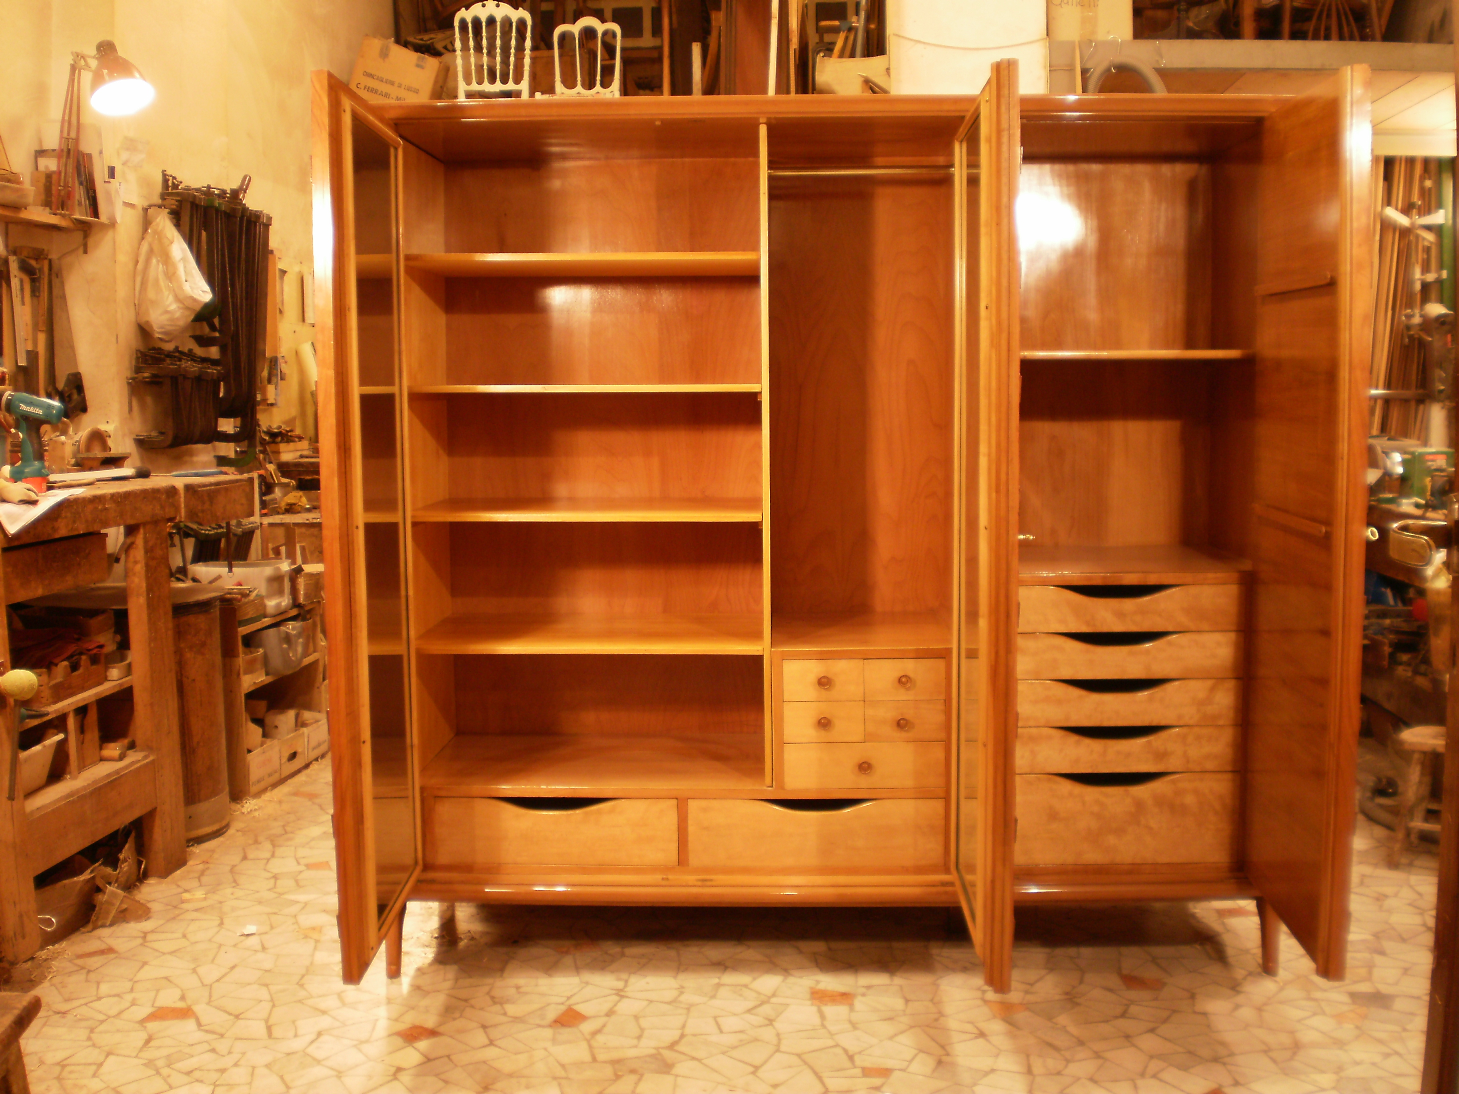 restauro mobili inizio 900 milano restauro modernariato